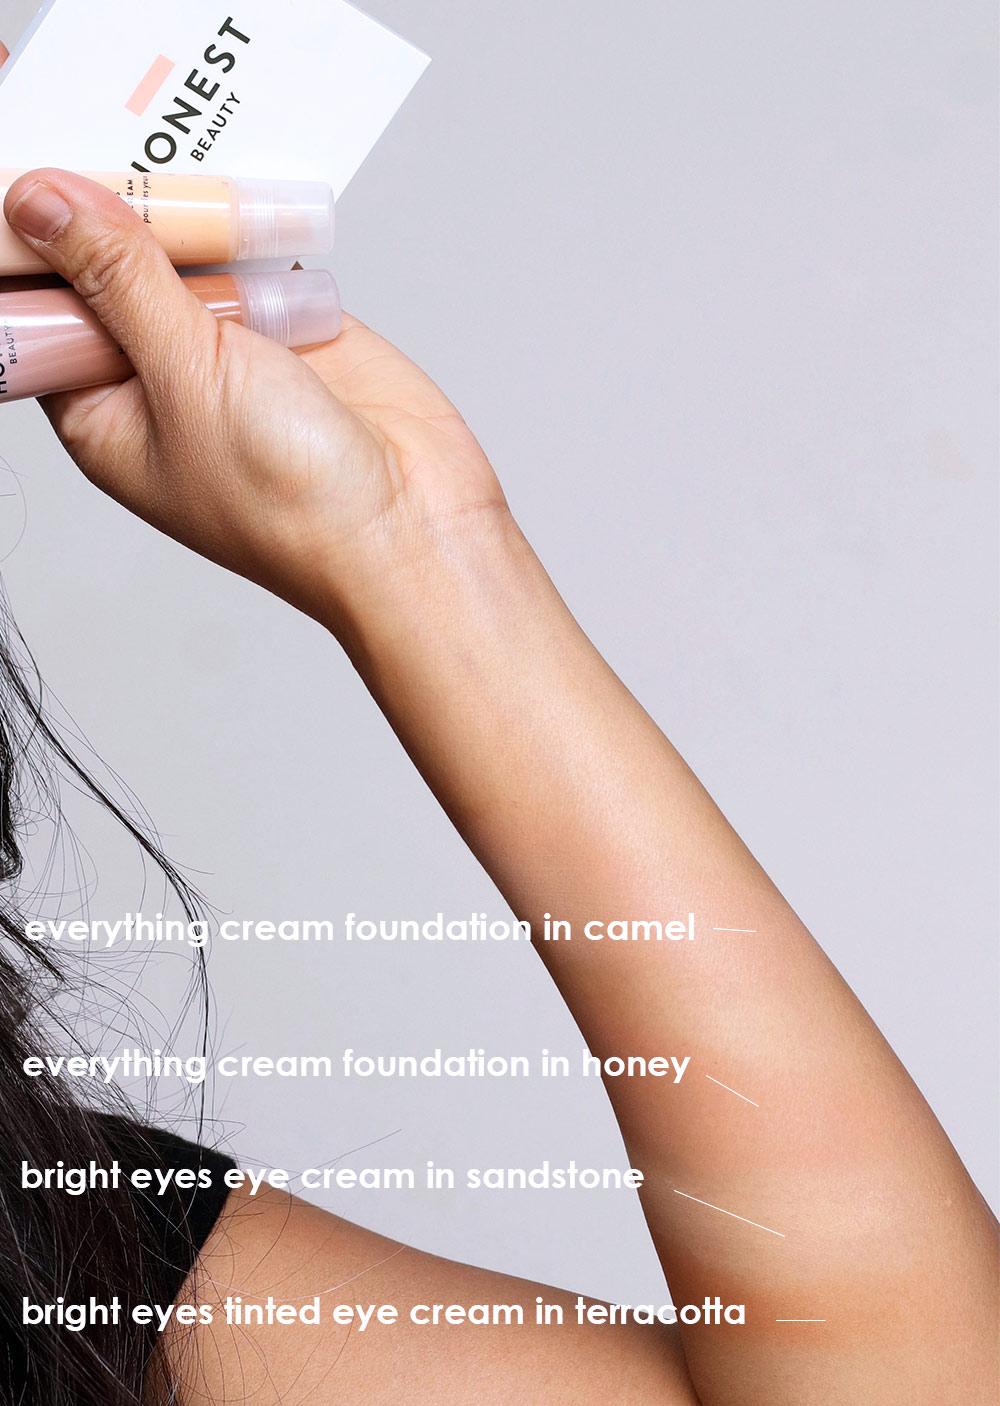 honest beauty cream foundation bright eyes tinted eye cream